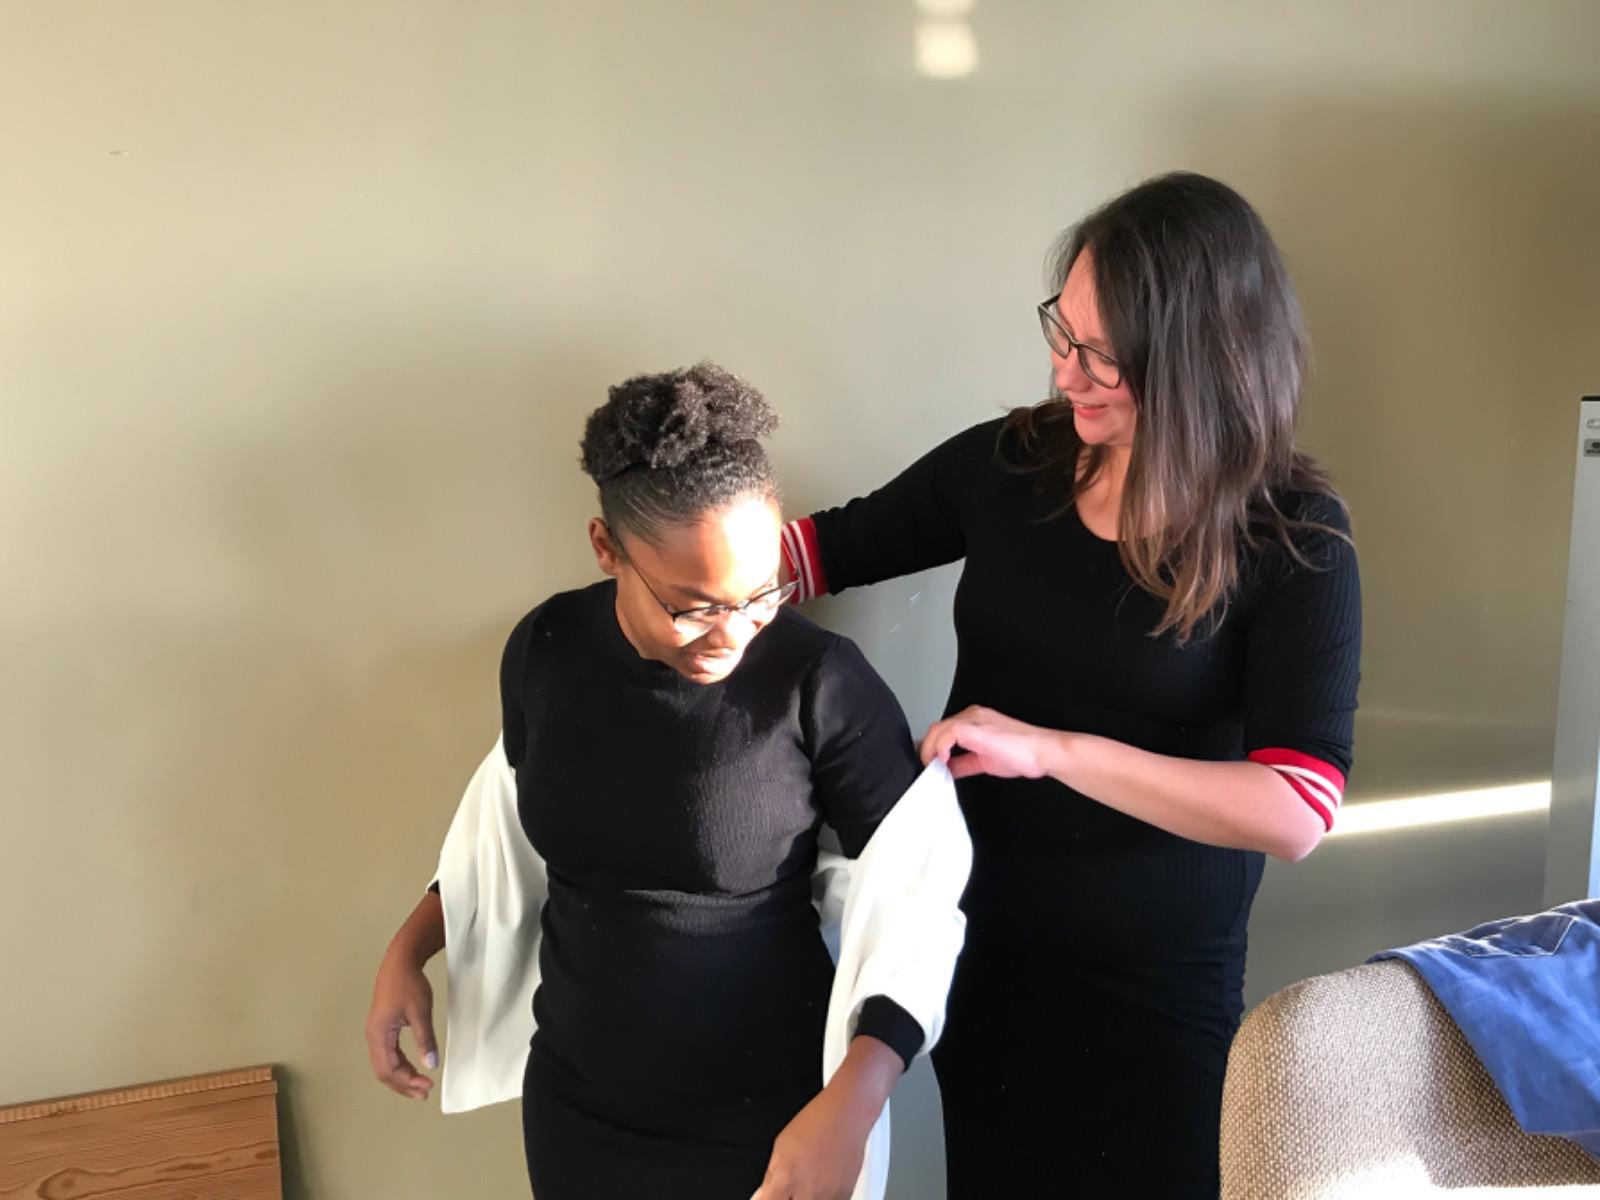 lisa pieplenbosch – style developer – helpen aankleden